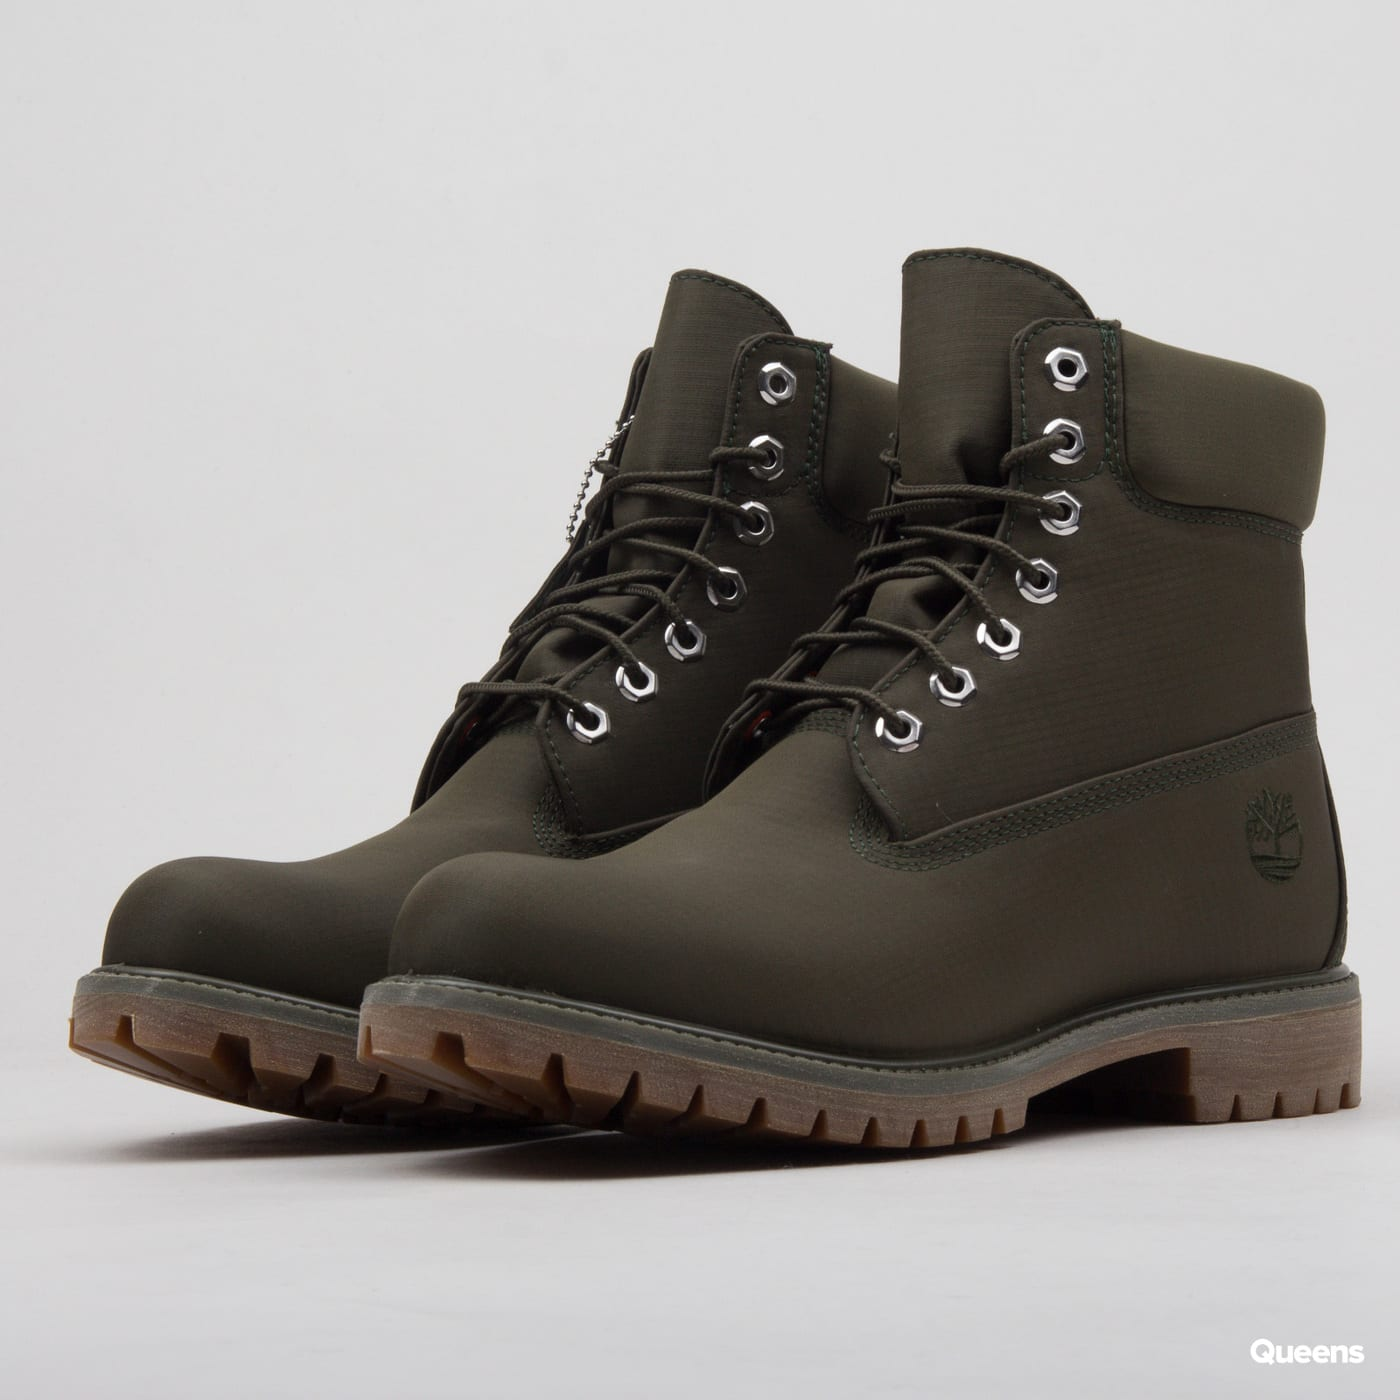 5098ddd3cde Pánska zimná obuv Timberland 6 in Premium Boot (A1R5Z-GRN)– Queens 💚